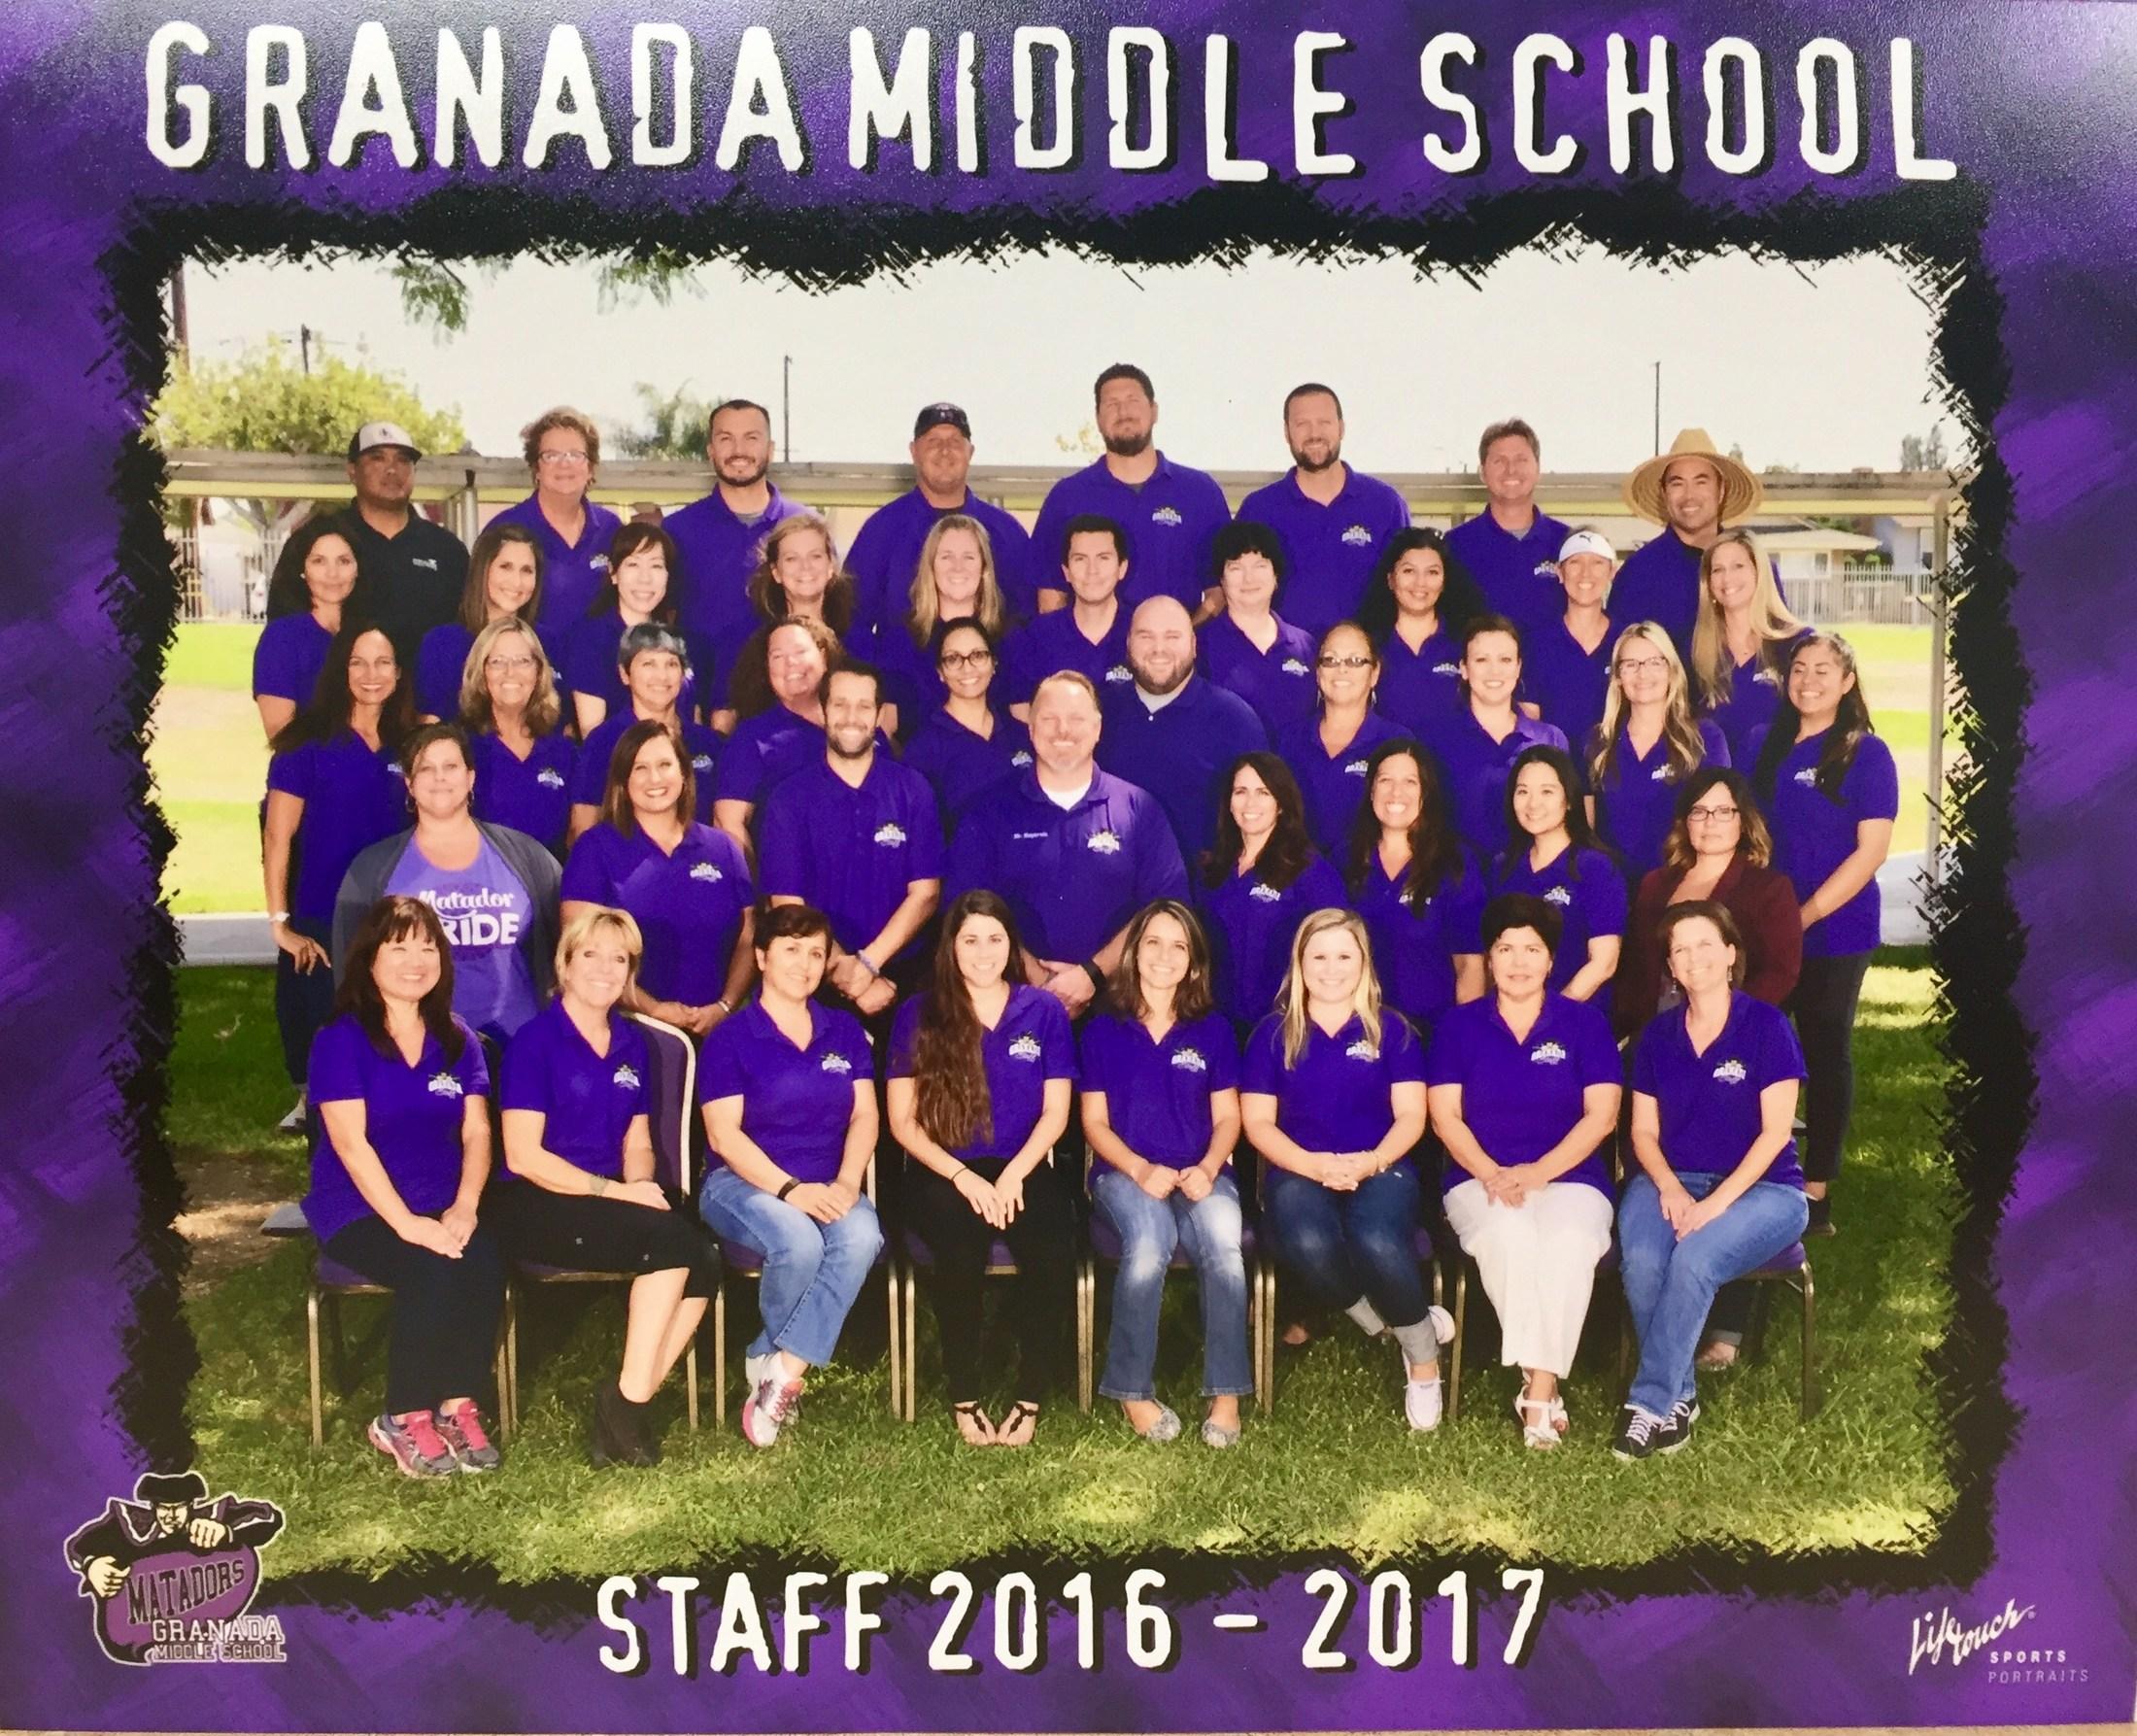 Granada Middle School staff for 2016-17